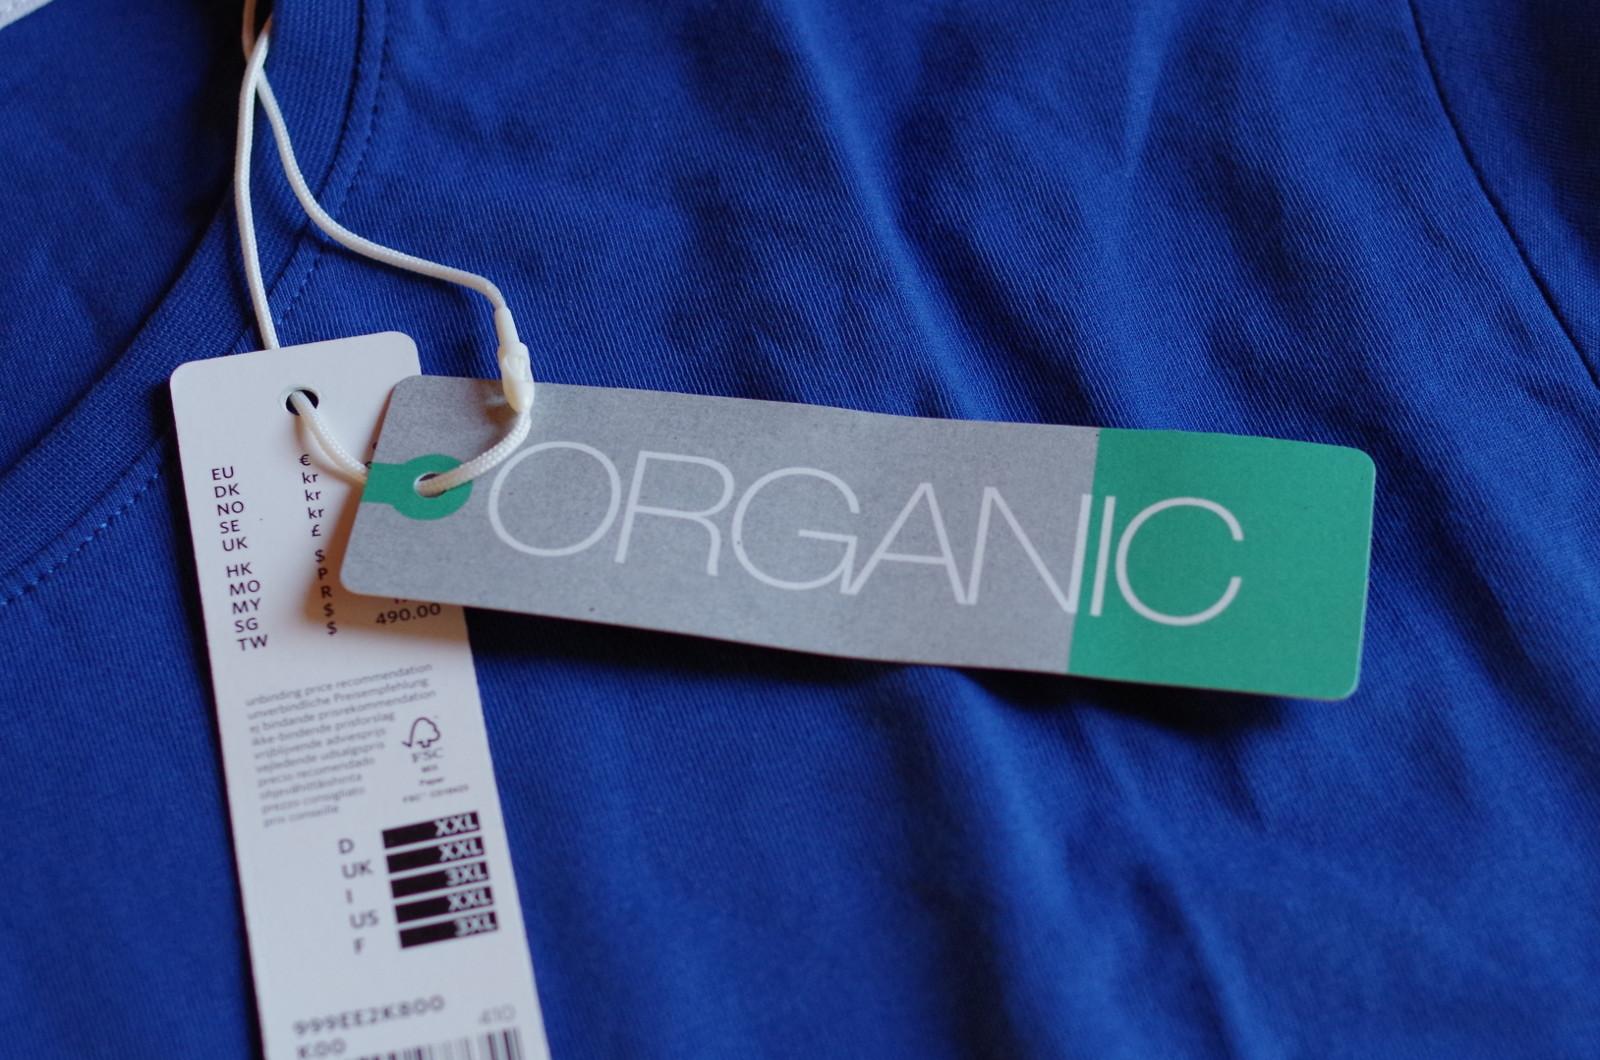 Organic (1).JPG